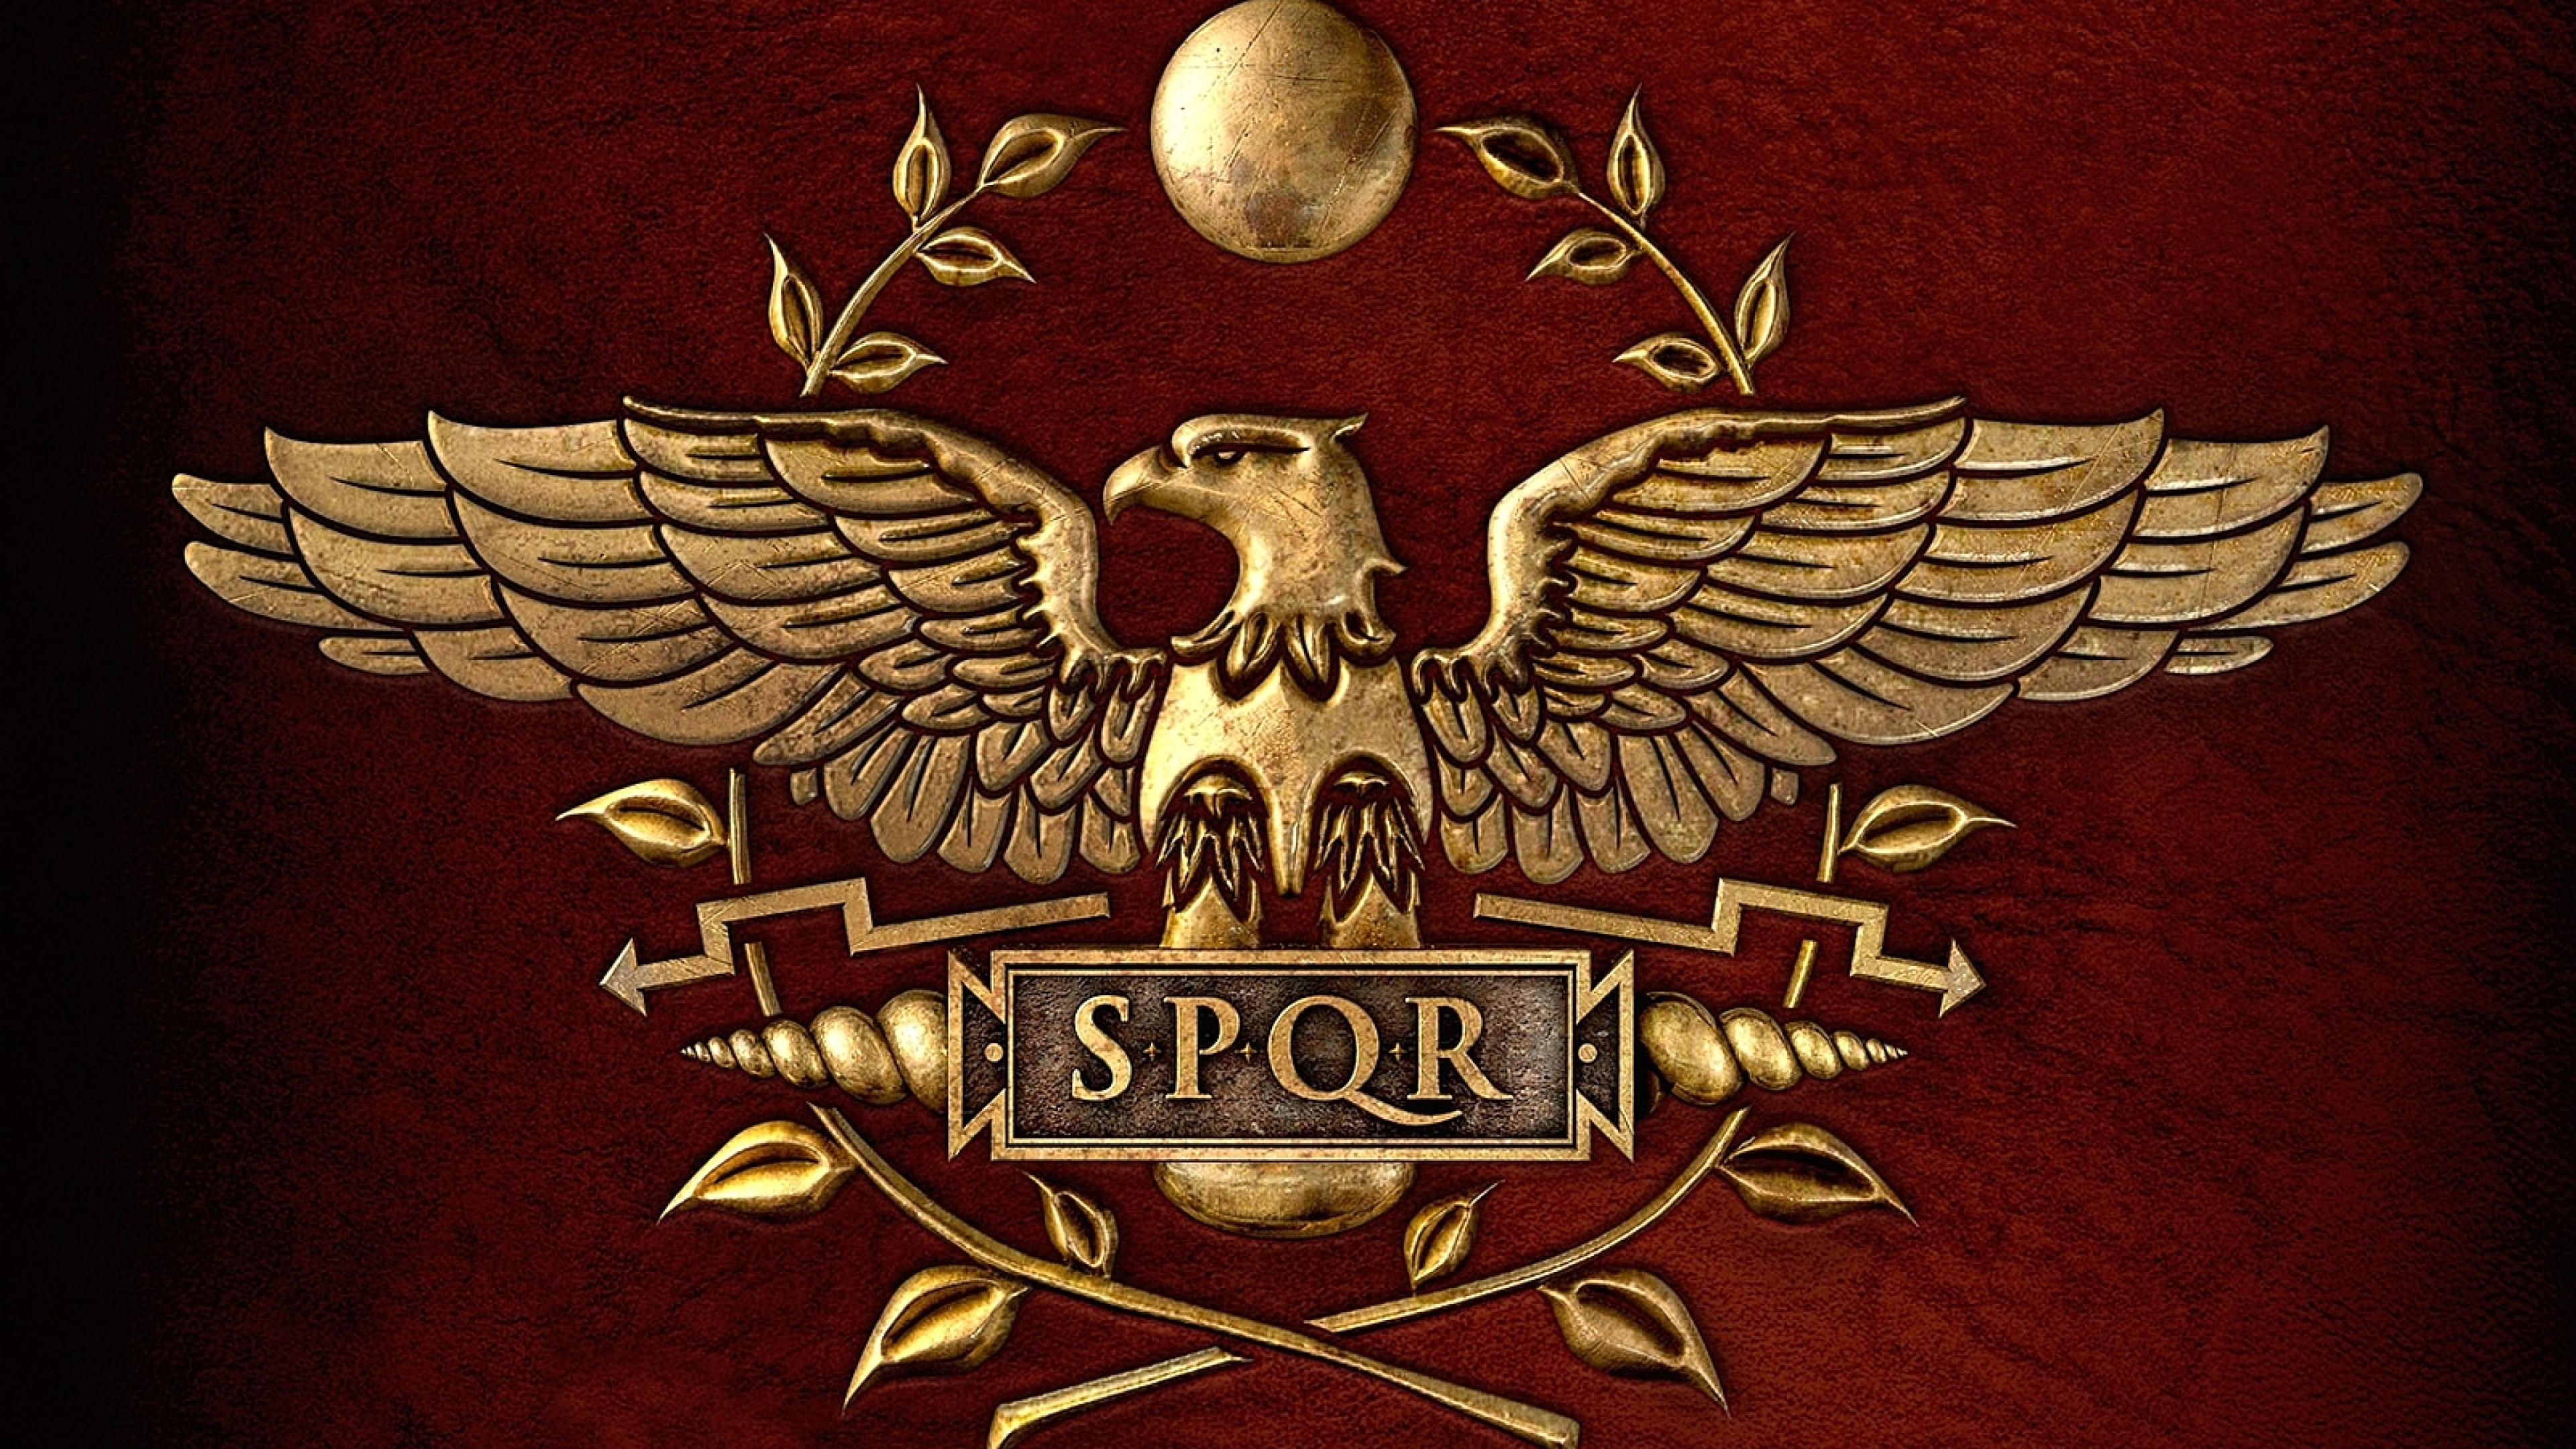 Wallpaper Roman Rome Total War Red 3840x2160 Tethys995